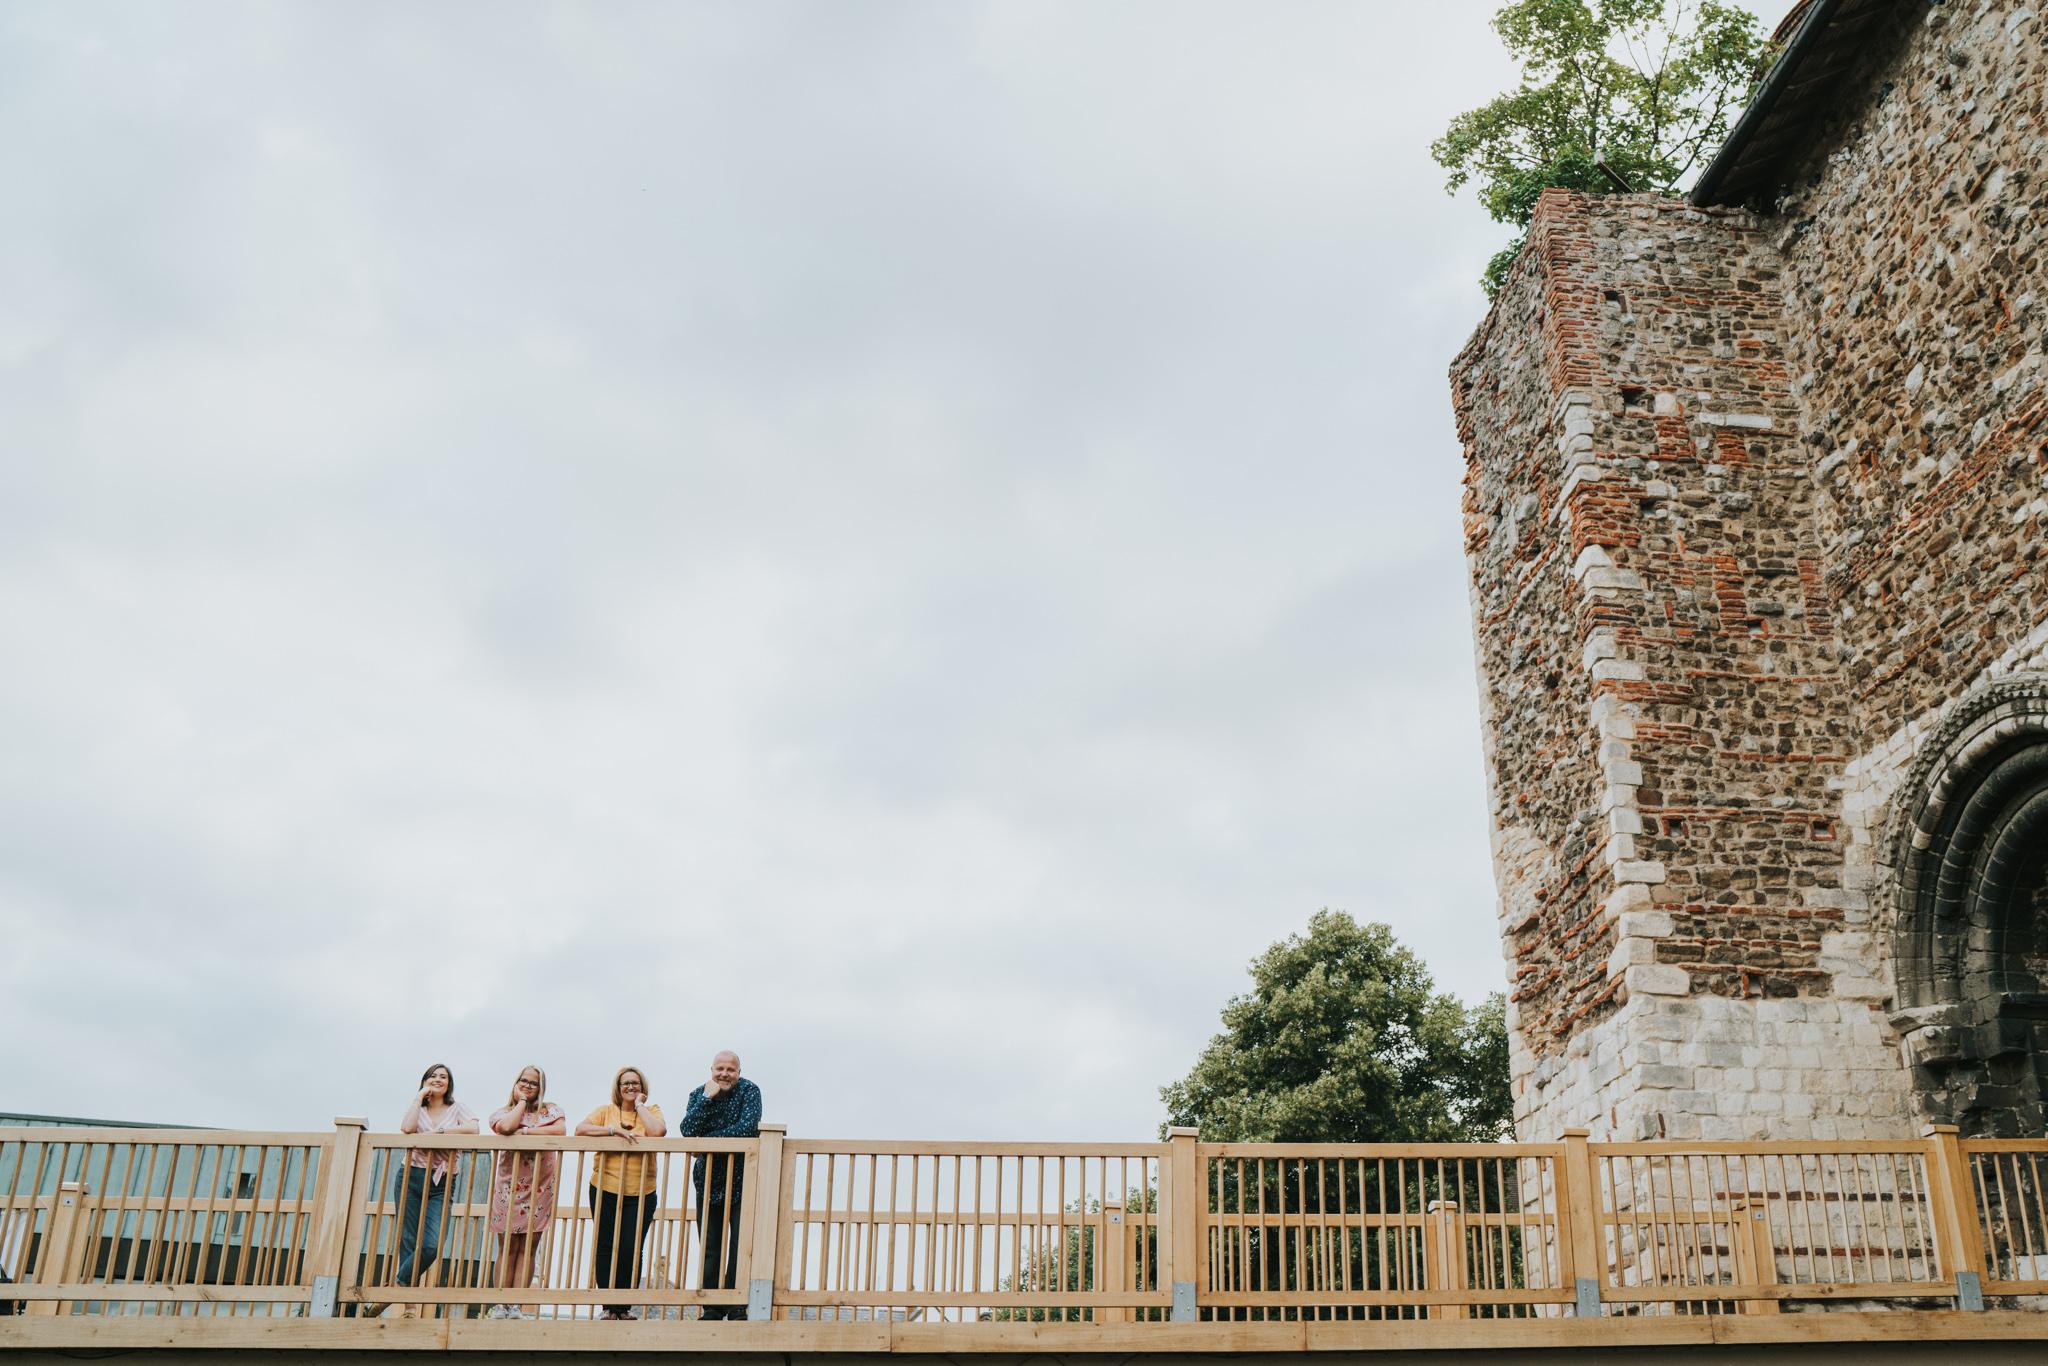 Fitch-Family-Colchester-Castle-Park-Grace-Elizabeth-Alternative-Wedding-Lifestyle-Photographer-Colchester-Essex-Suffolk-Norfolk-Devon (38 of 41).jpg